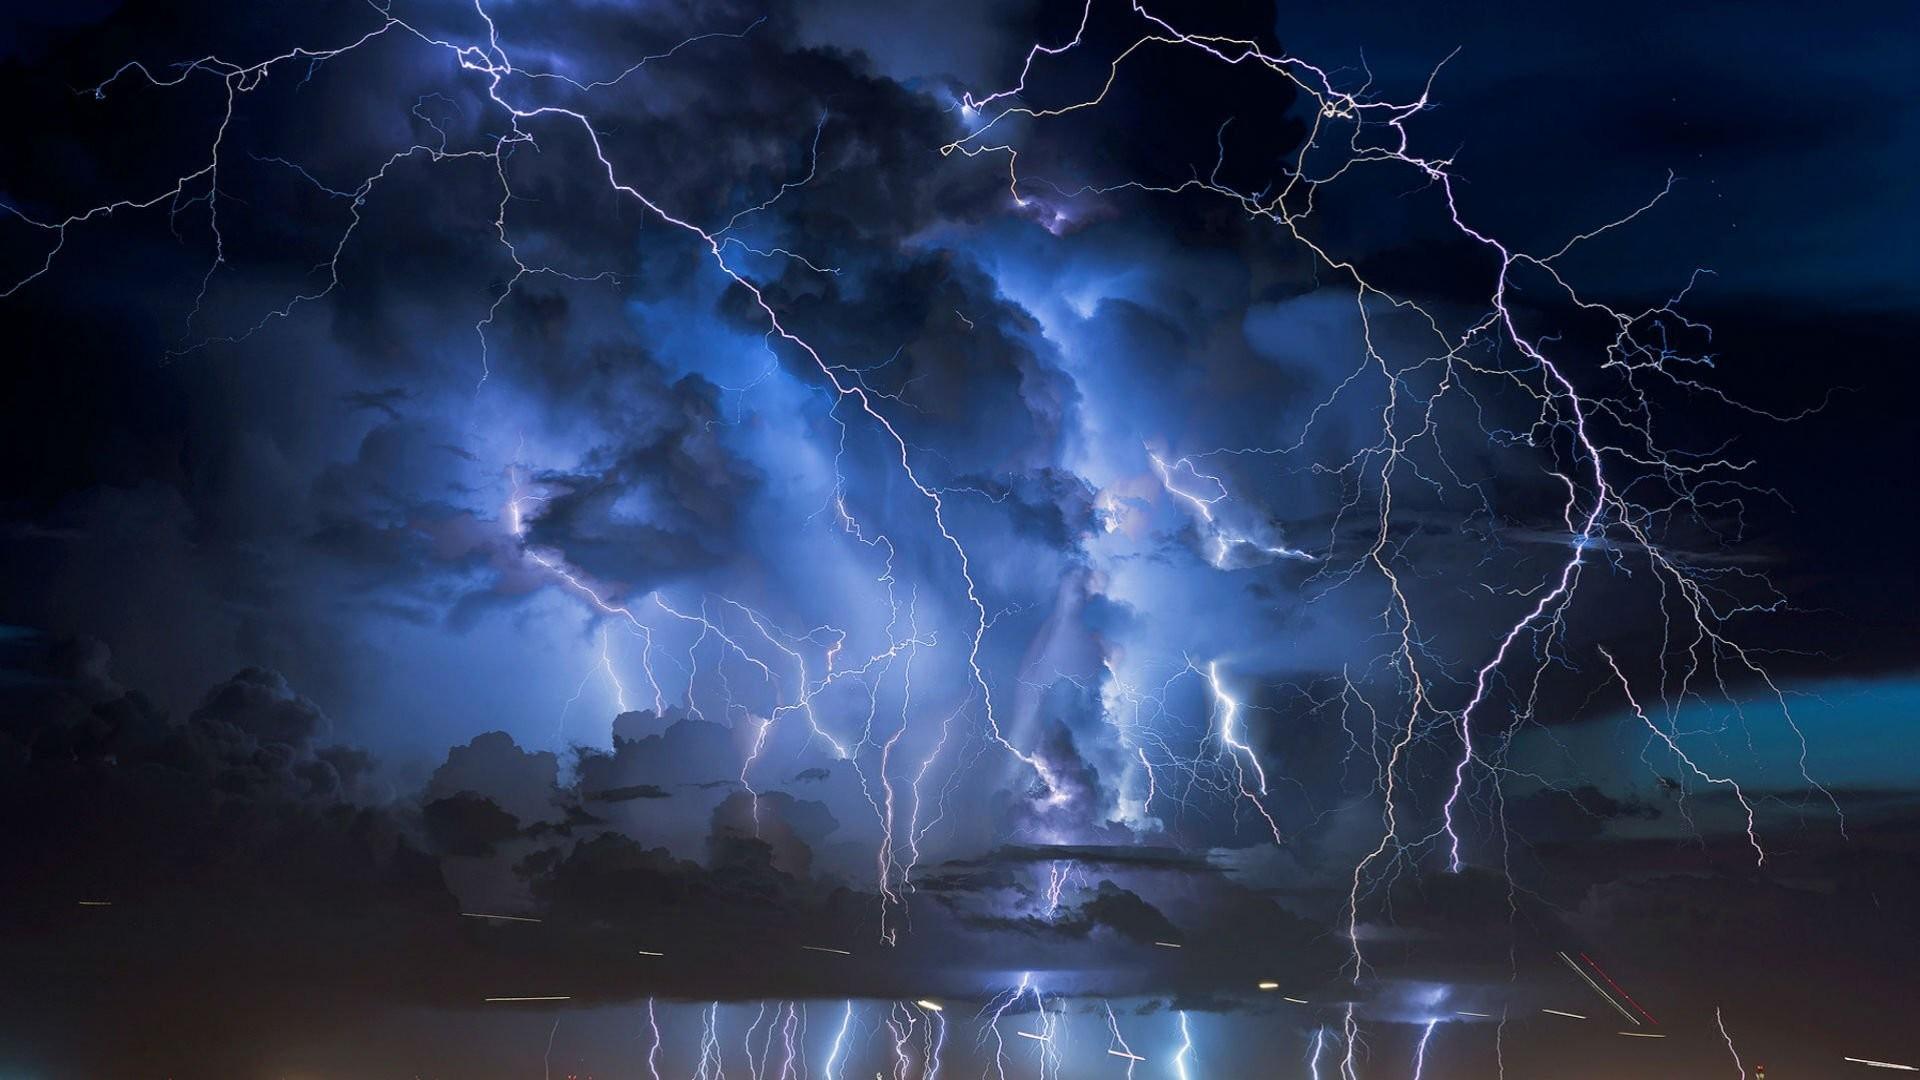 Cities Nature Sky Storm City Clouds Lightning Night Weather Landscape Rain  Best Desktop Wallpaper Hd